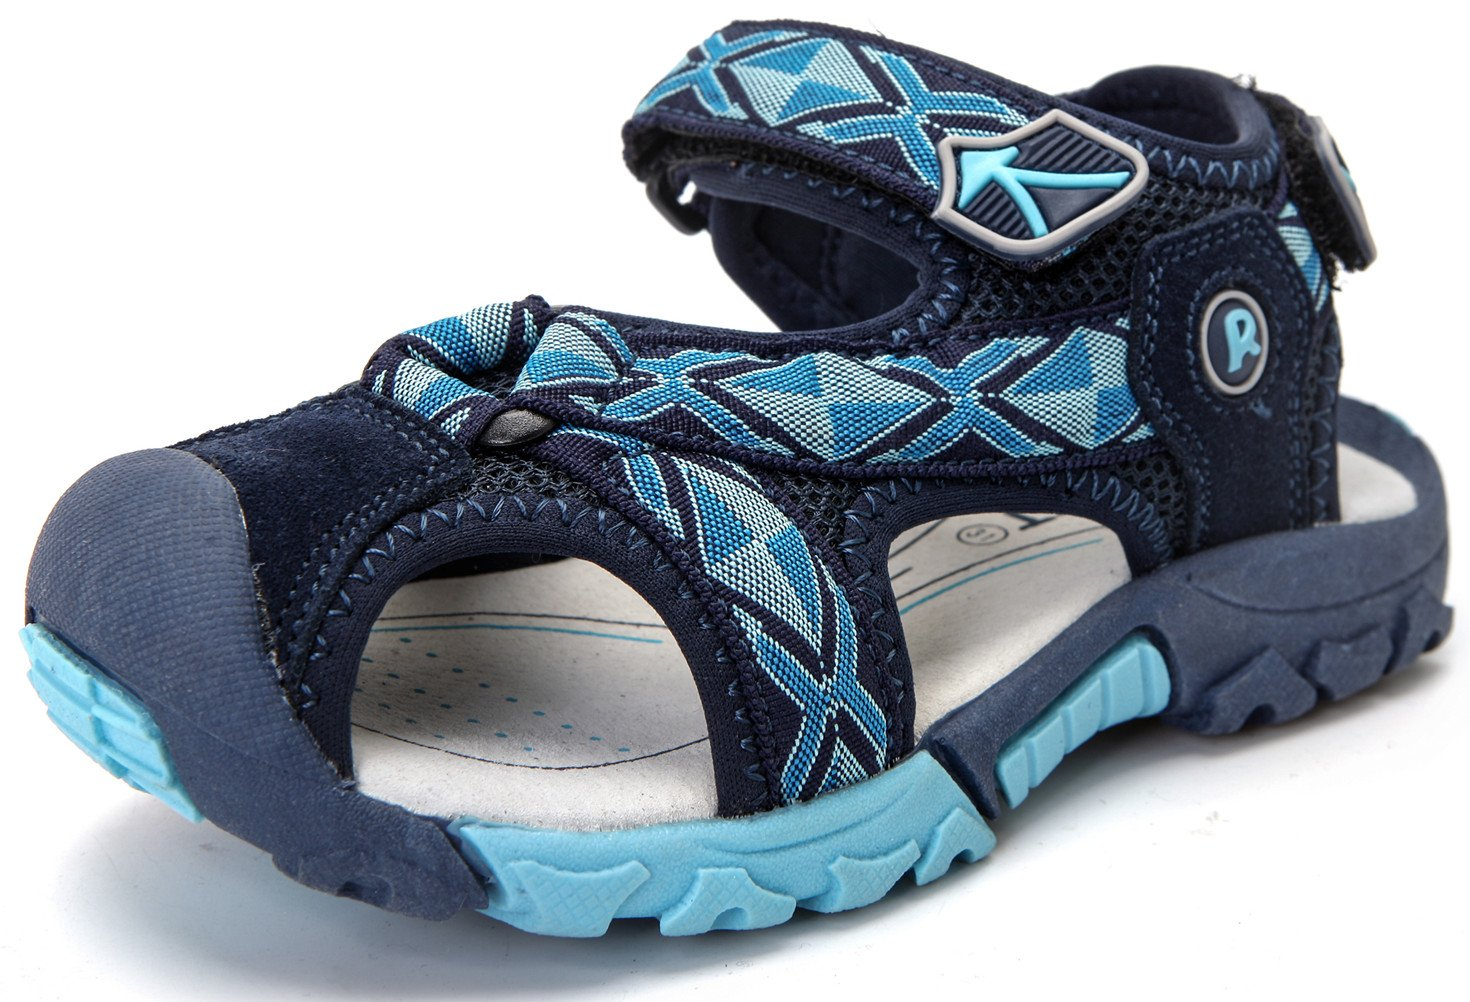 DADAWEN Summer Beach Outdoor Closed-Toe Sandals for Boys and Girls (Toddler/Little Kid/Big Kid) Dark Blue US Size 13 M Little Kid